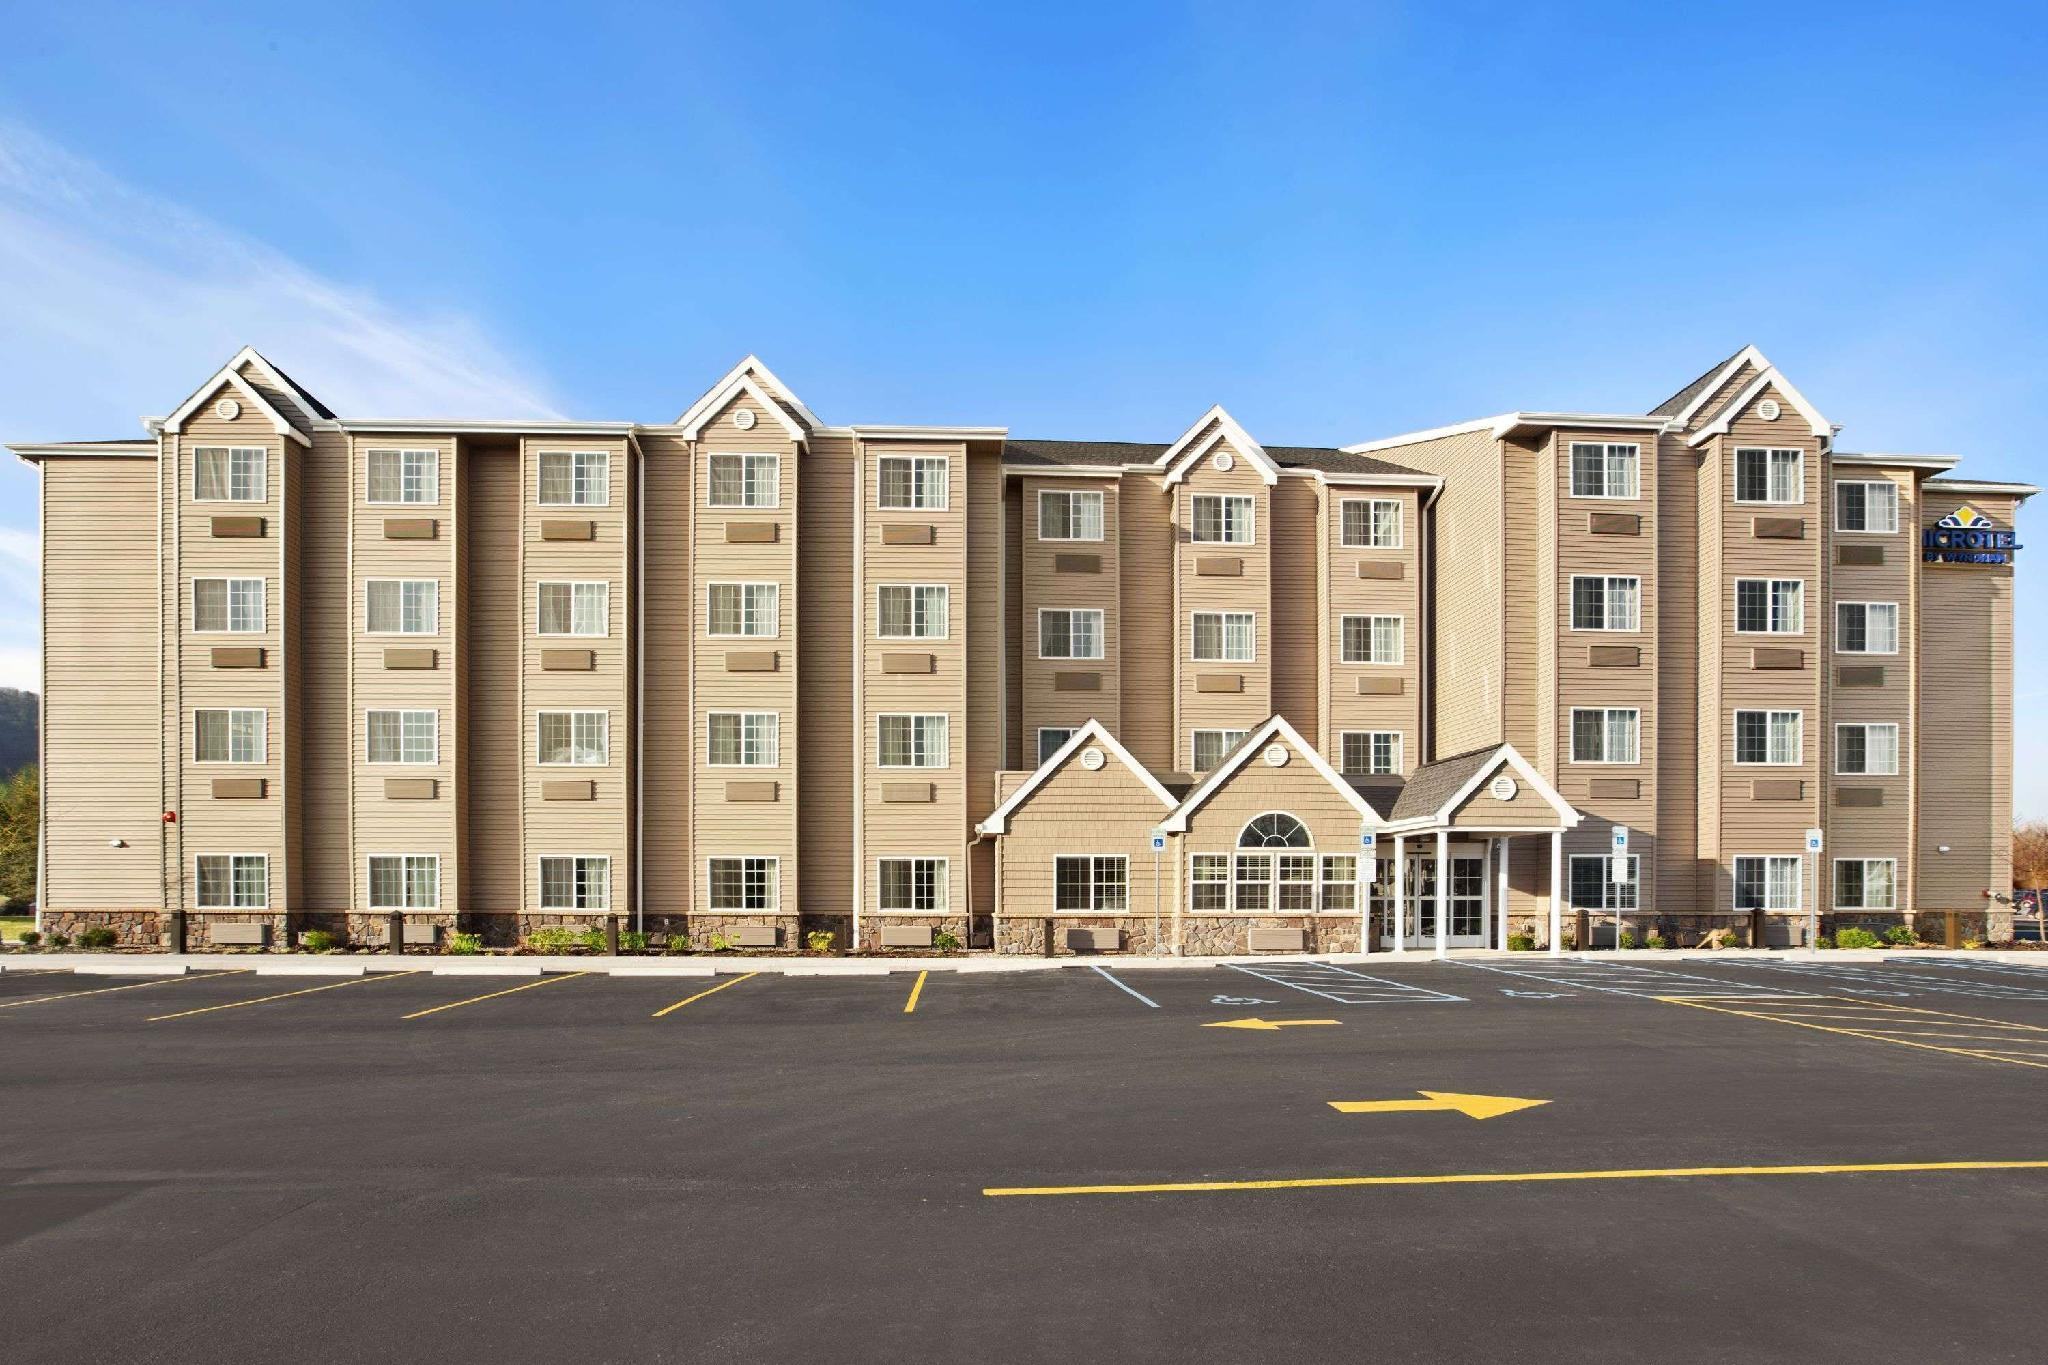 Microtel Inn And Suites By Wyndham Sayre